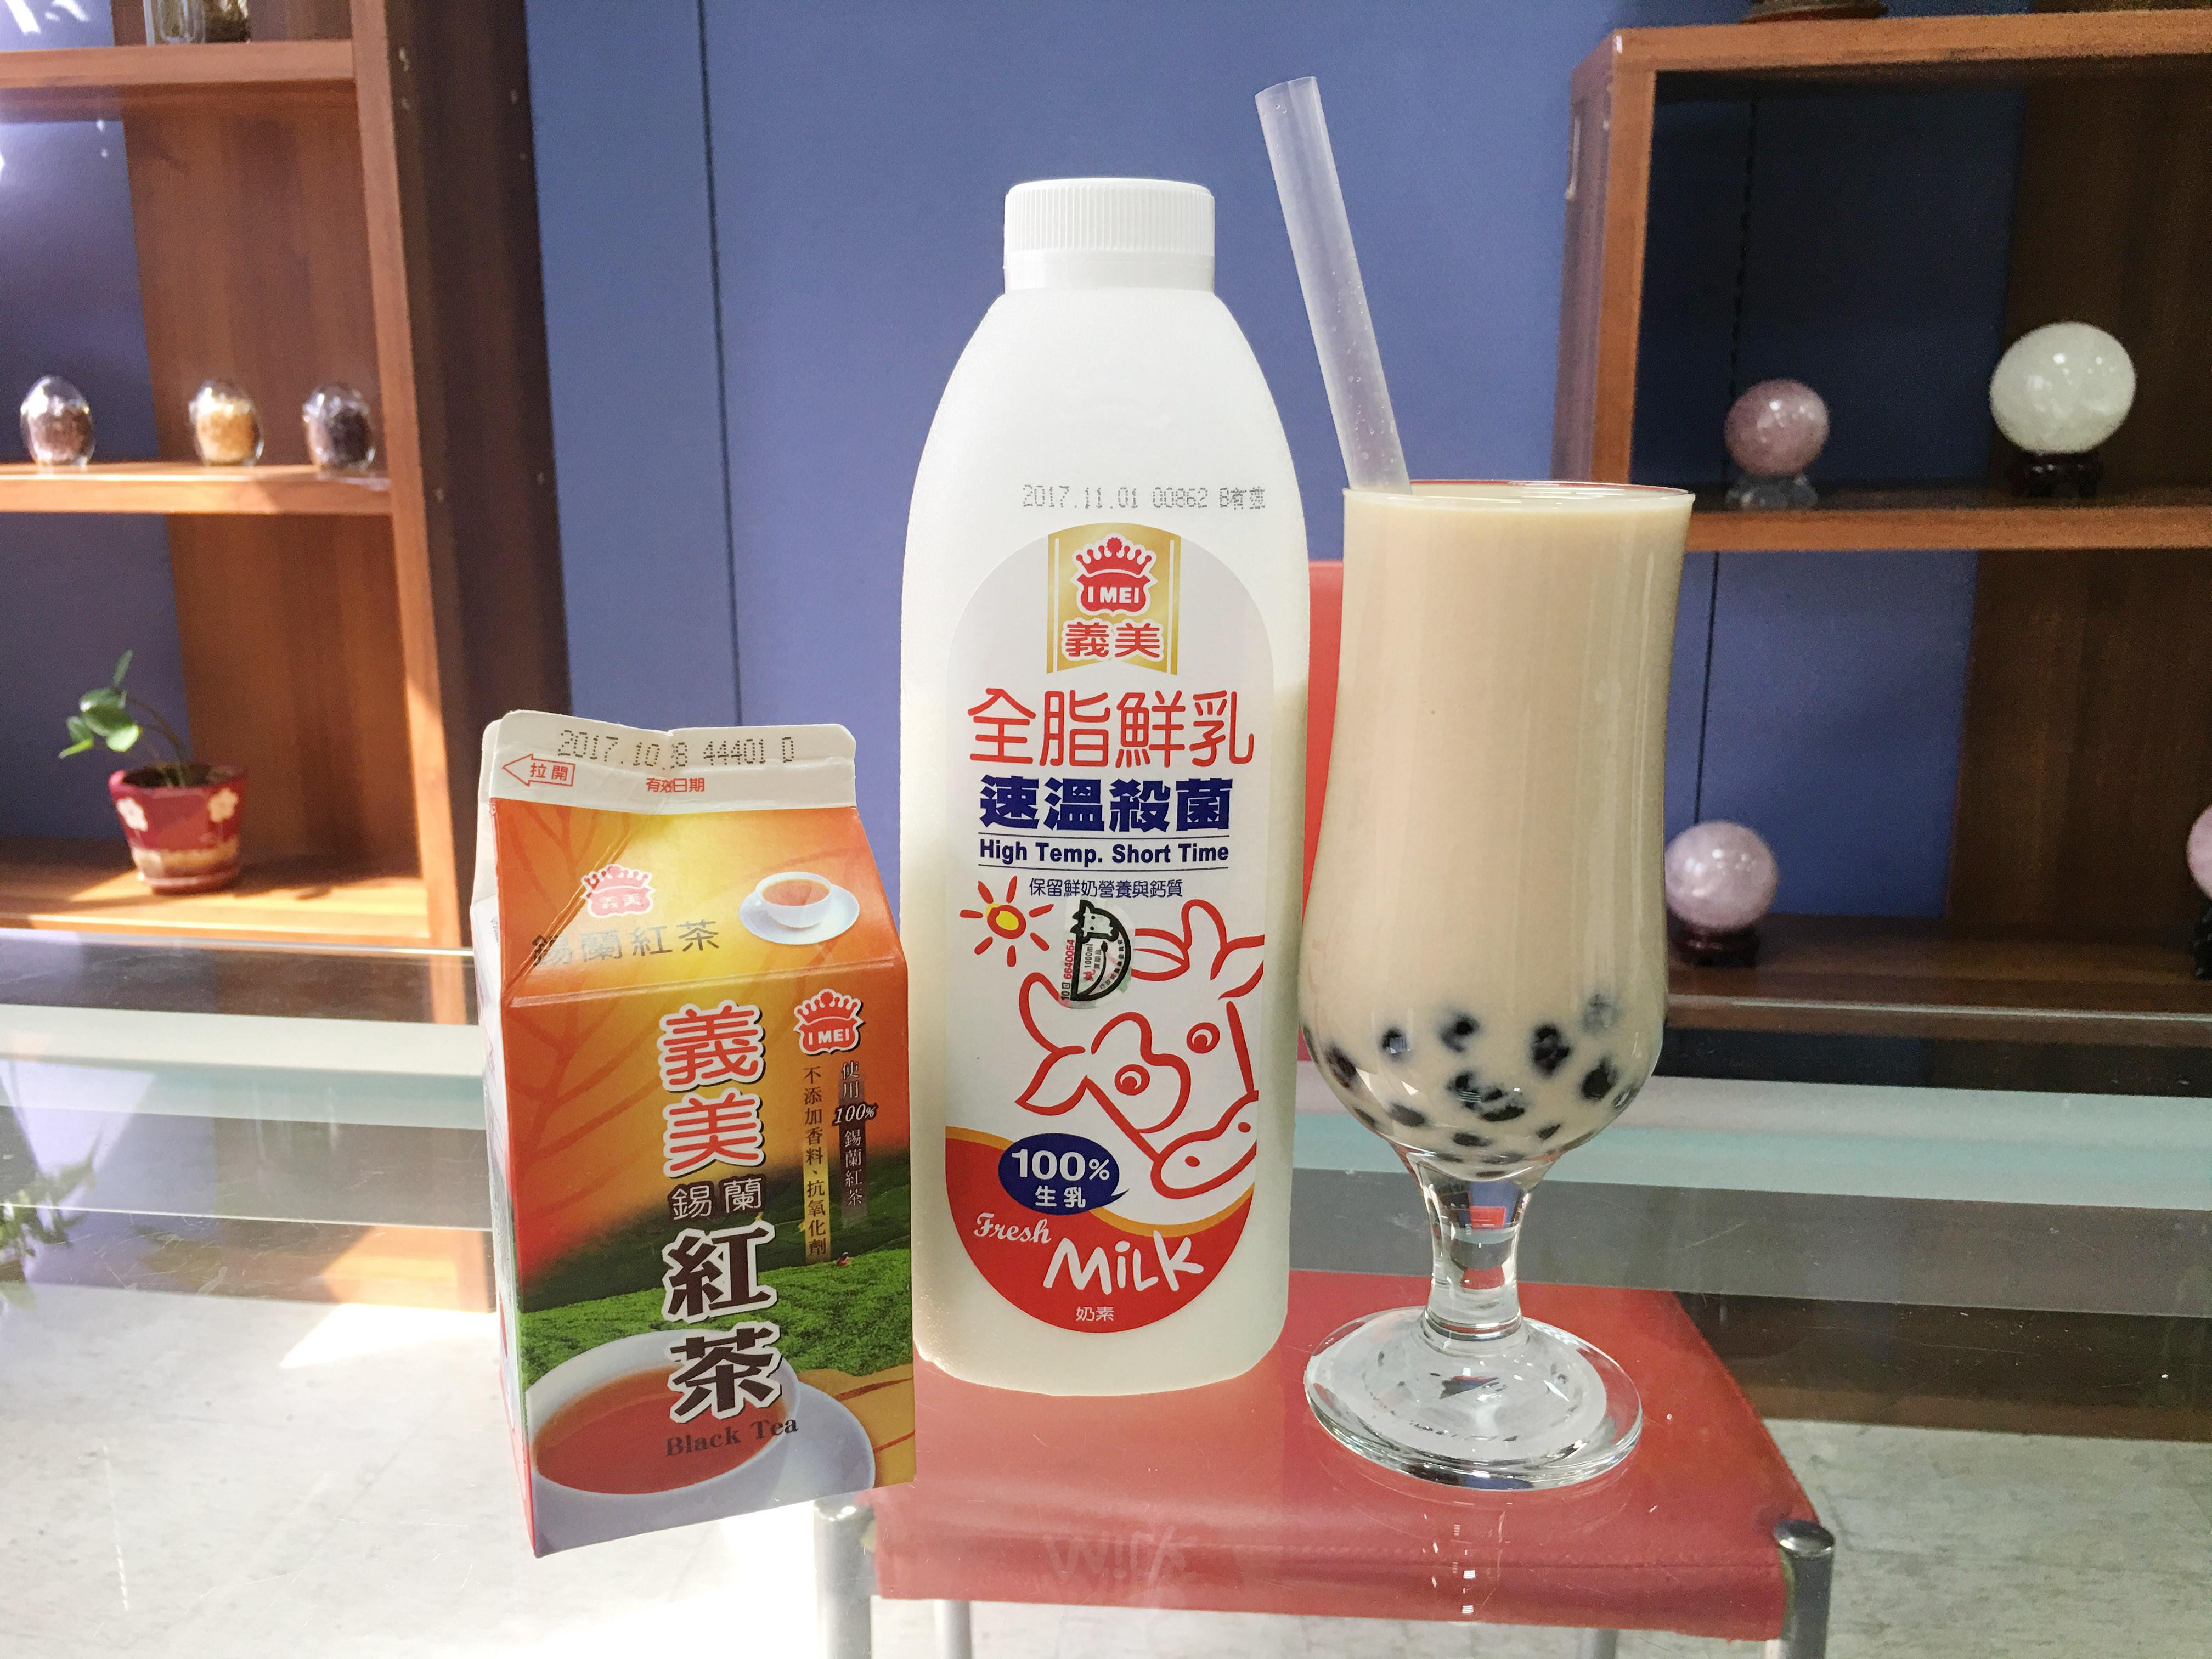 DIY蜂蜜珍珠厚奶茶